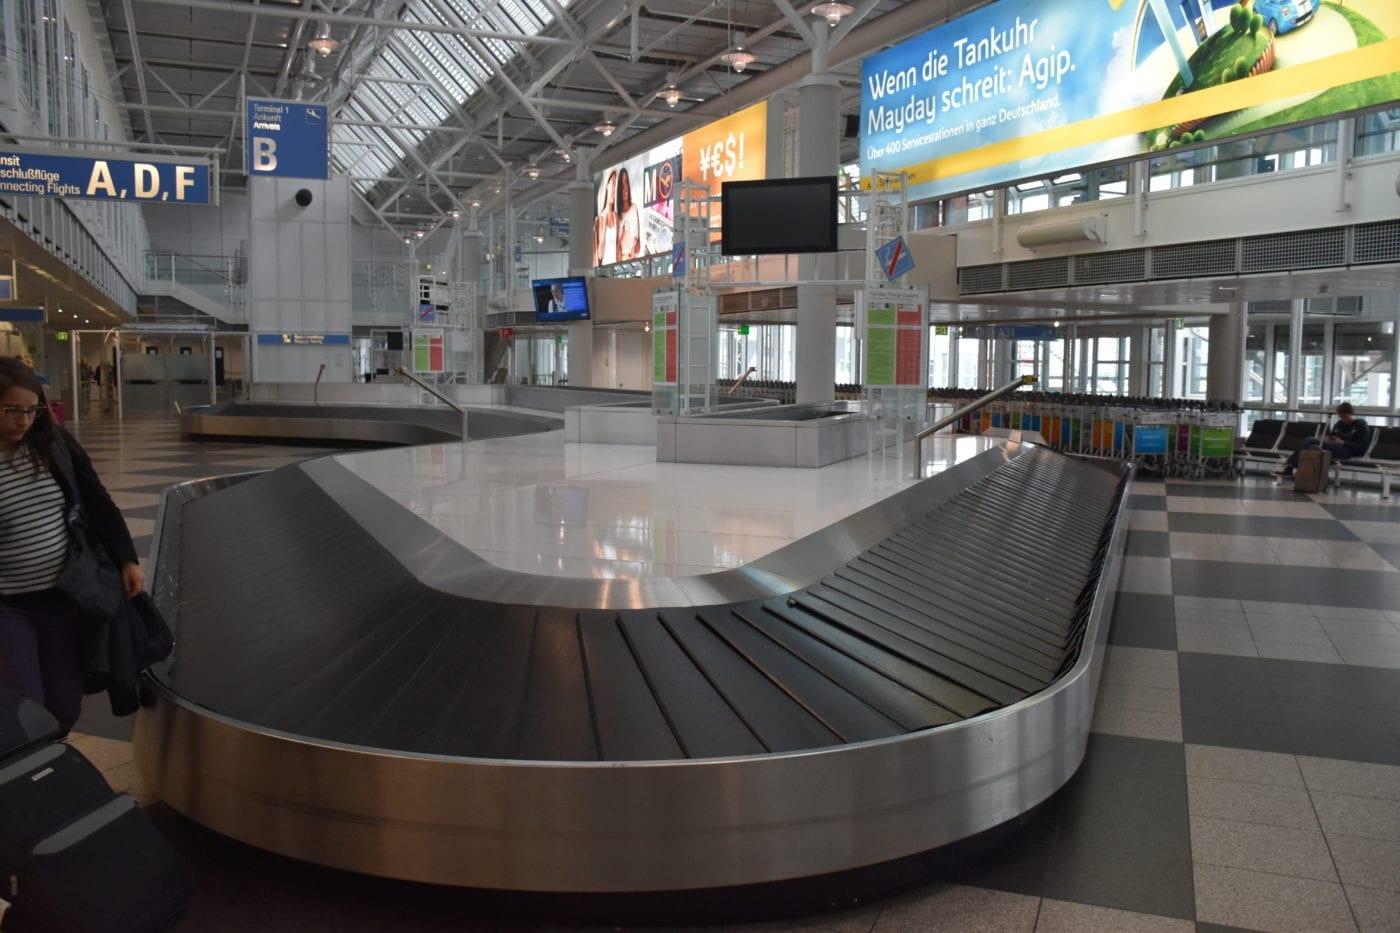 airport baggage claim carousel